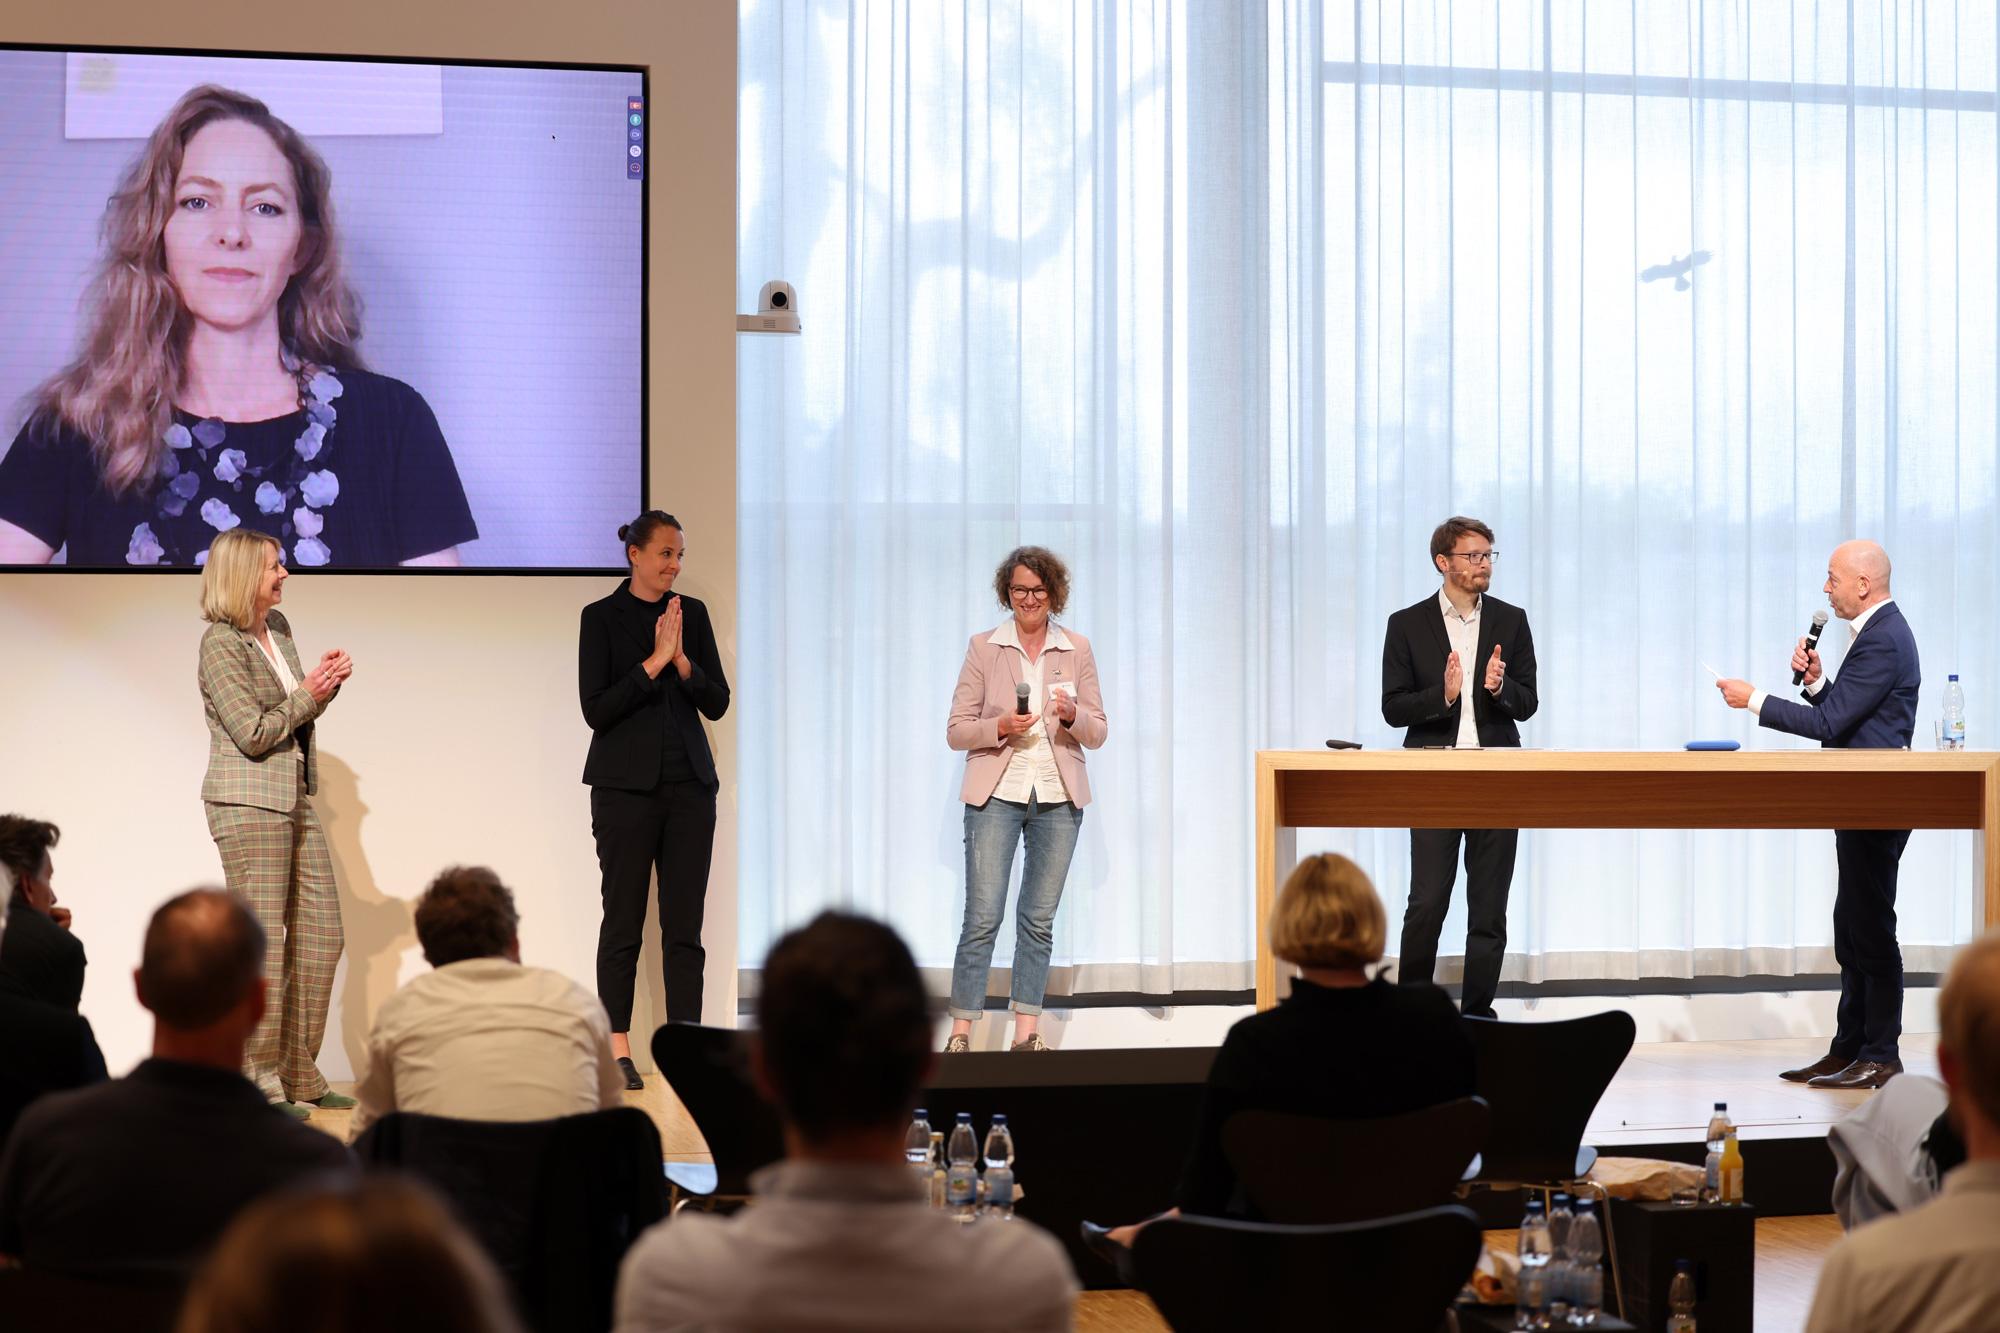 Kategorie Forschung, DGNB Sustainability Challenge 2021